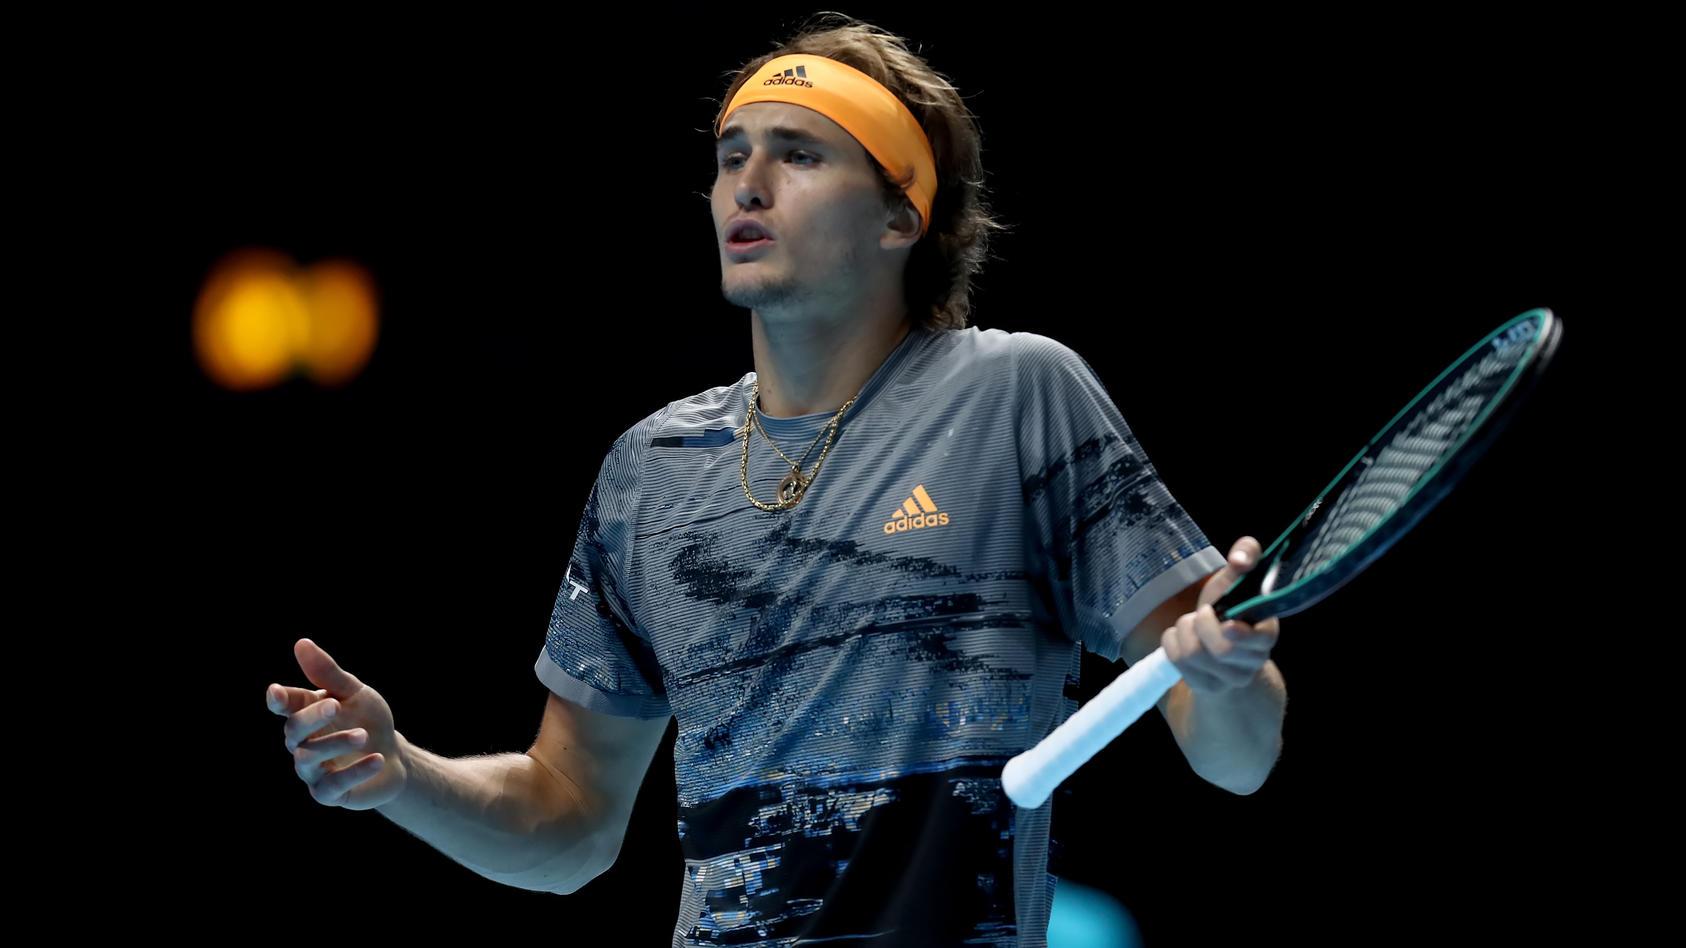 16th November 2019; 02 Arena. London, England; Nitto ATP, Tennis Herren Tennis Finals; A frustrated Alexander Zverev (Ge